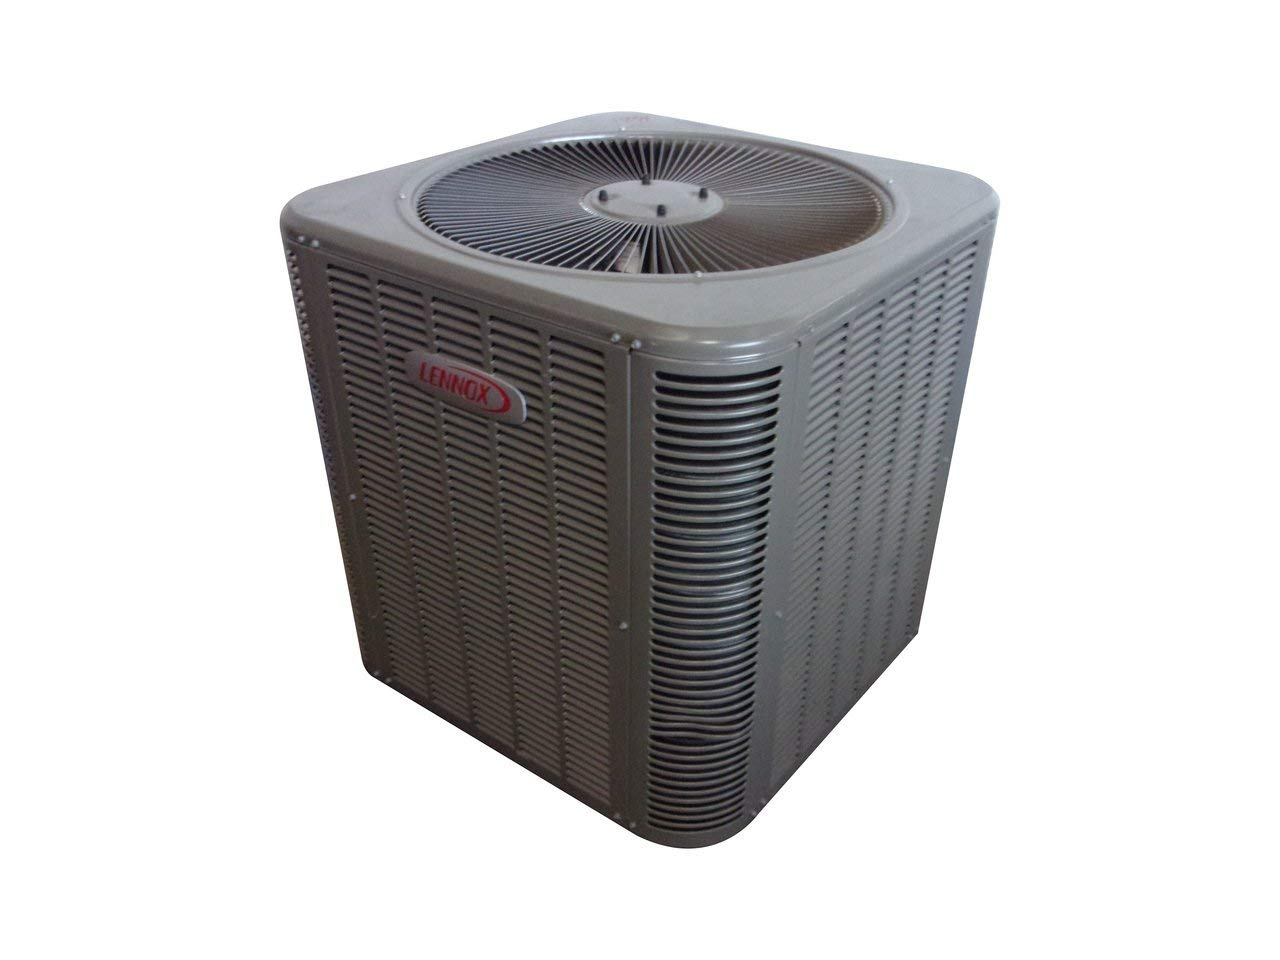 "Lennox""Scratch & Dent"" Central Air Conditioner Condenser 14ACXS024-230A19 ACC-10738"